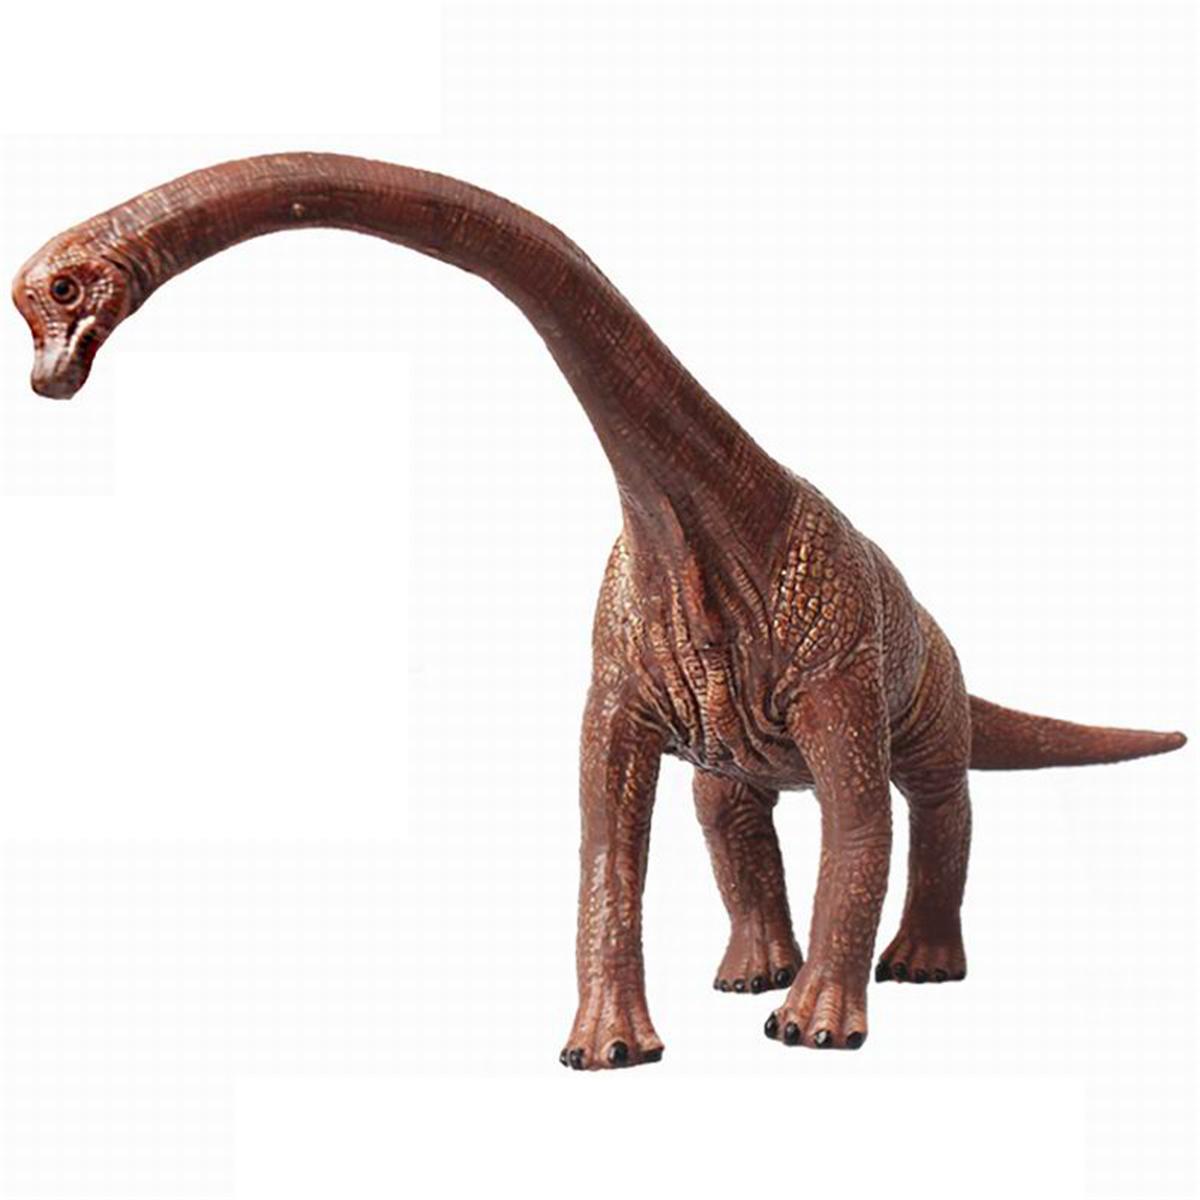 Educational Large Brachiosaurus Dinosaur Toy Diecast Model Birthday Gift For Boy Kids